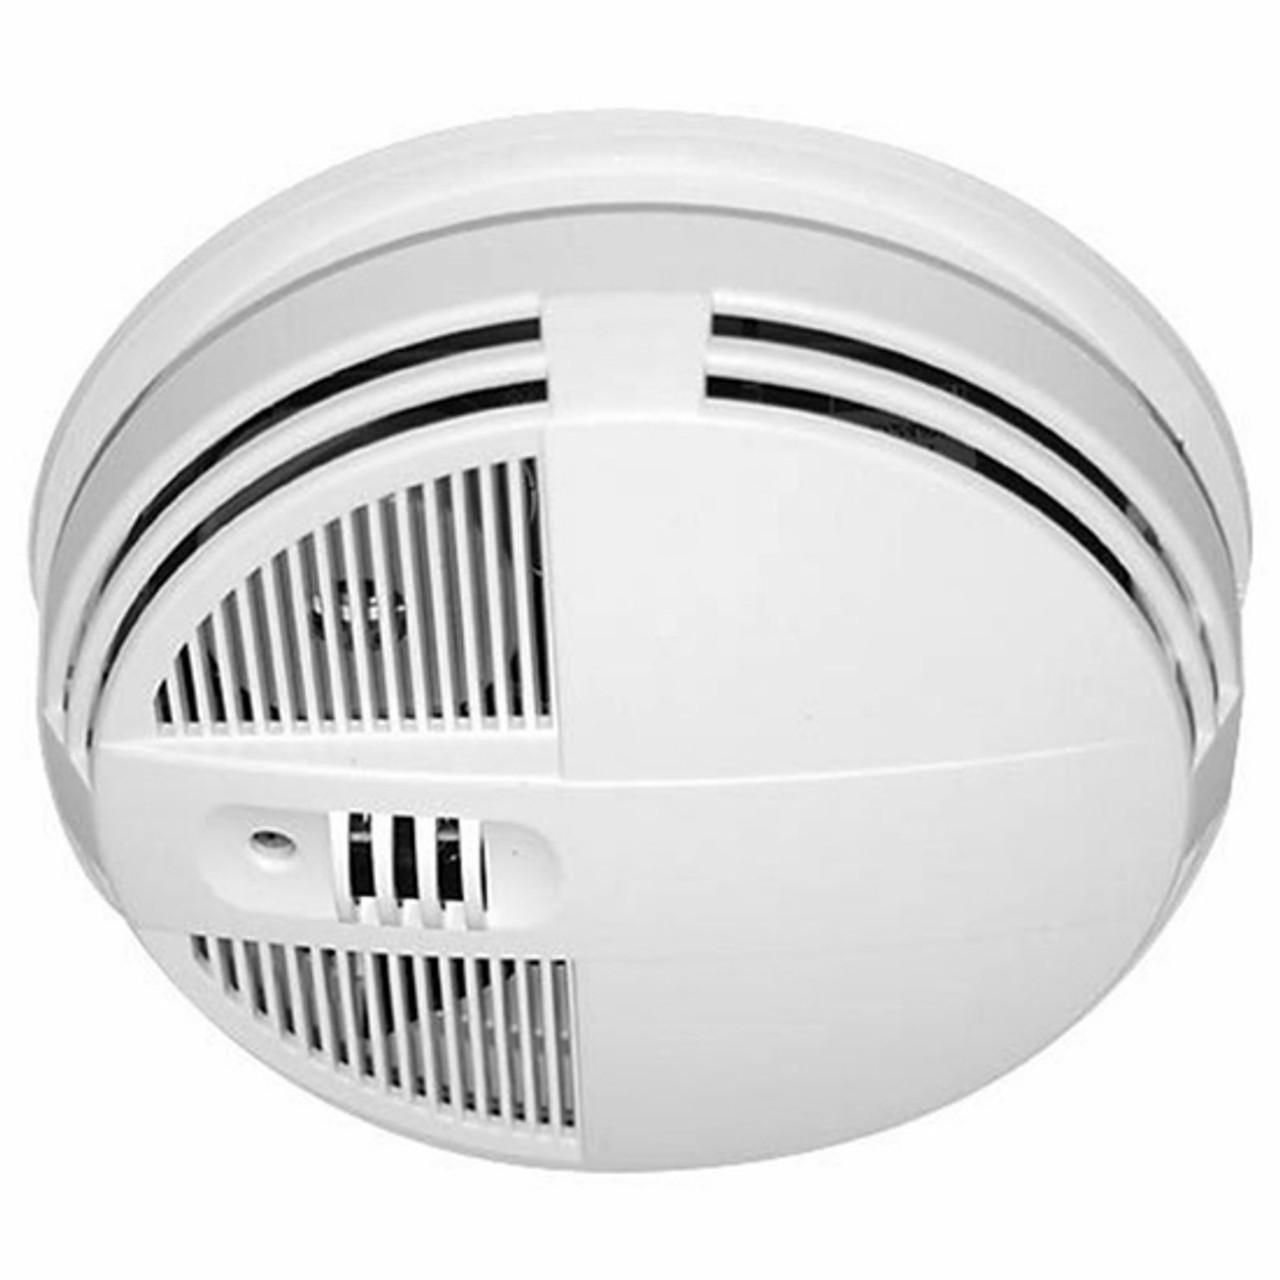 Smoke Detector Hidden Camera Hd With Nightvision